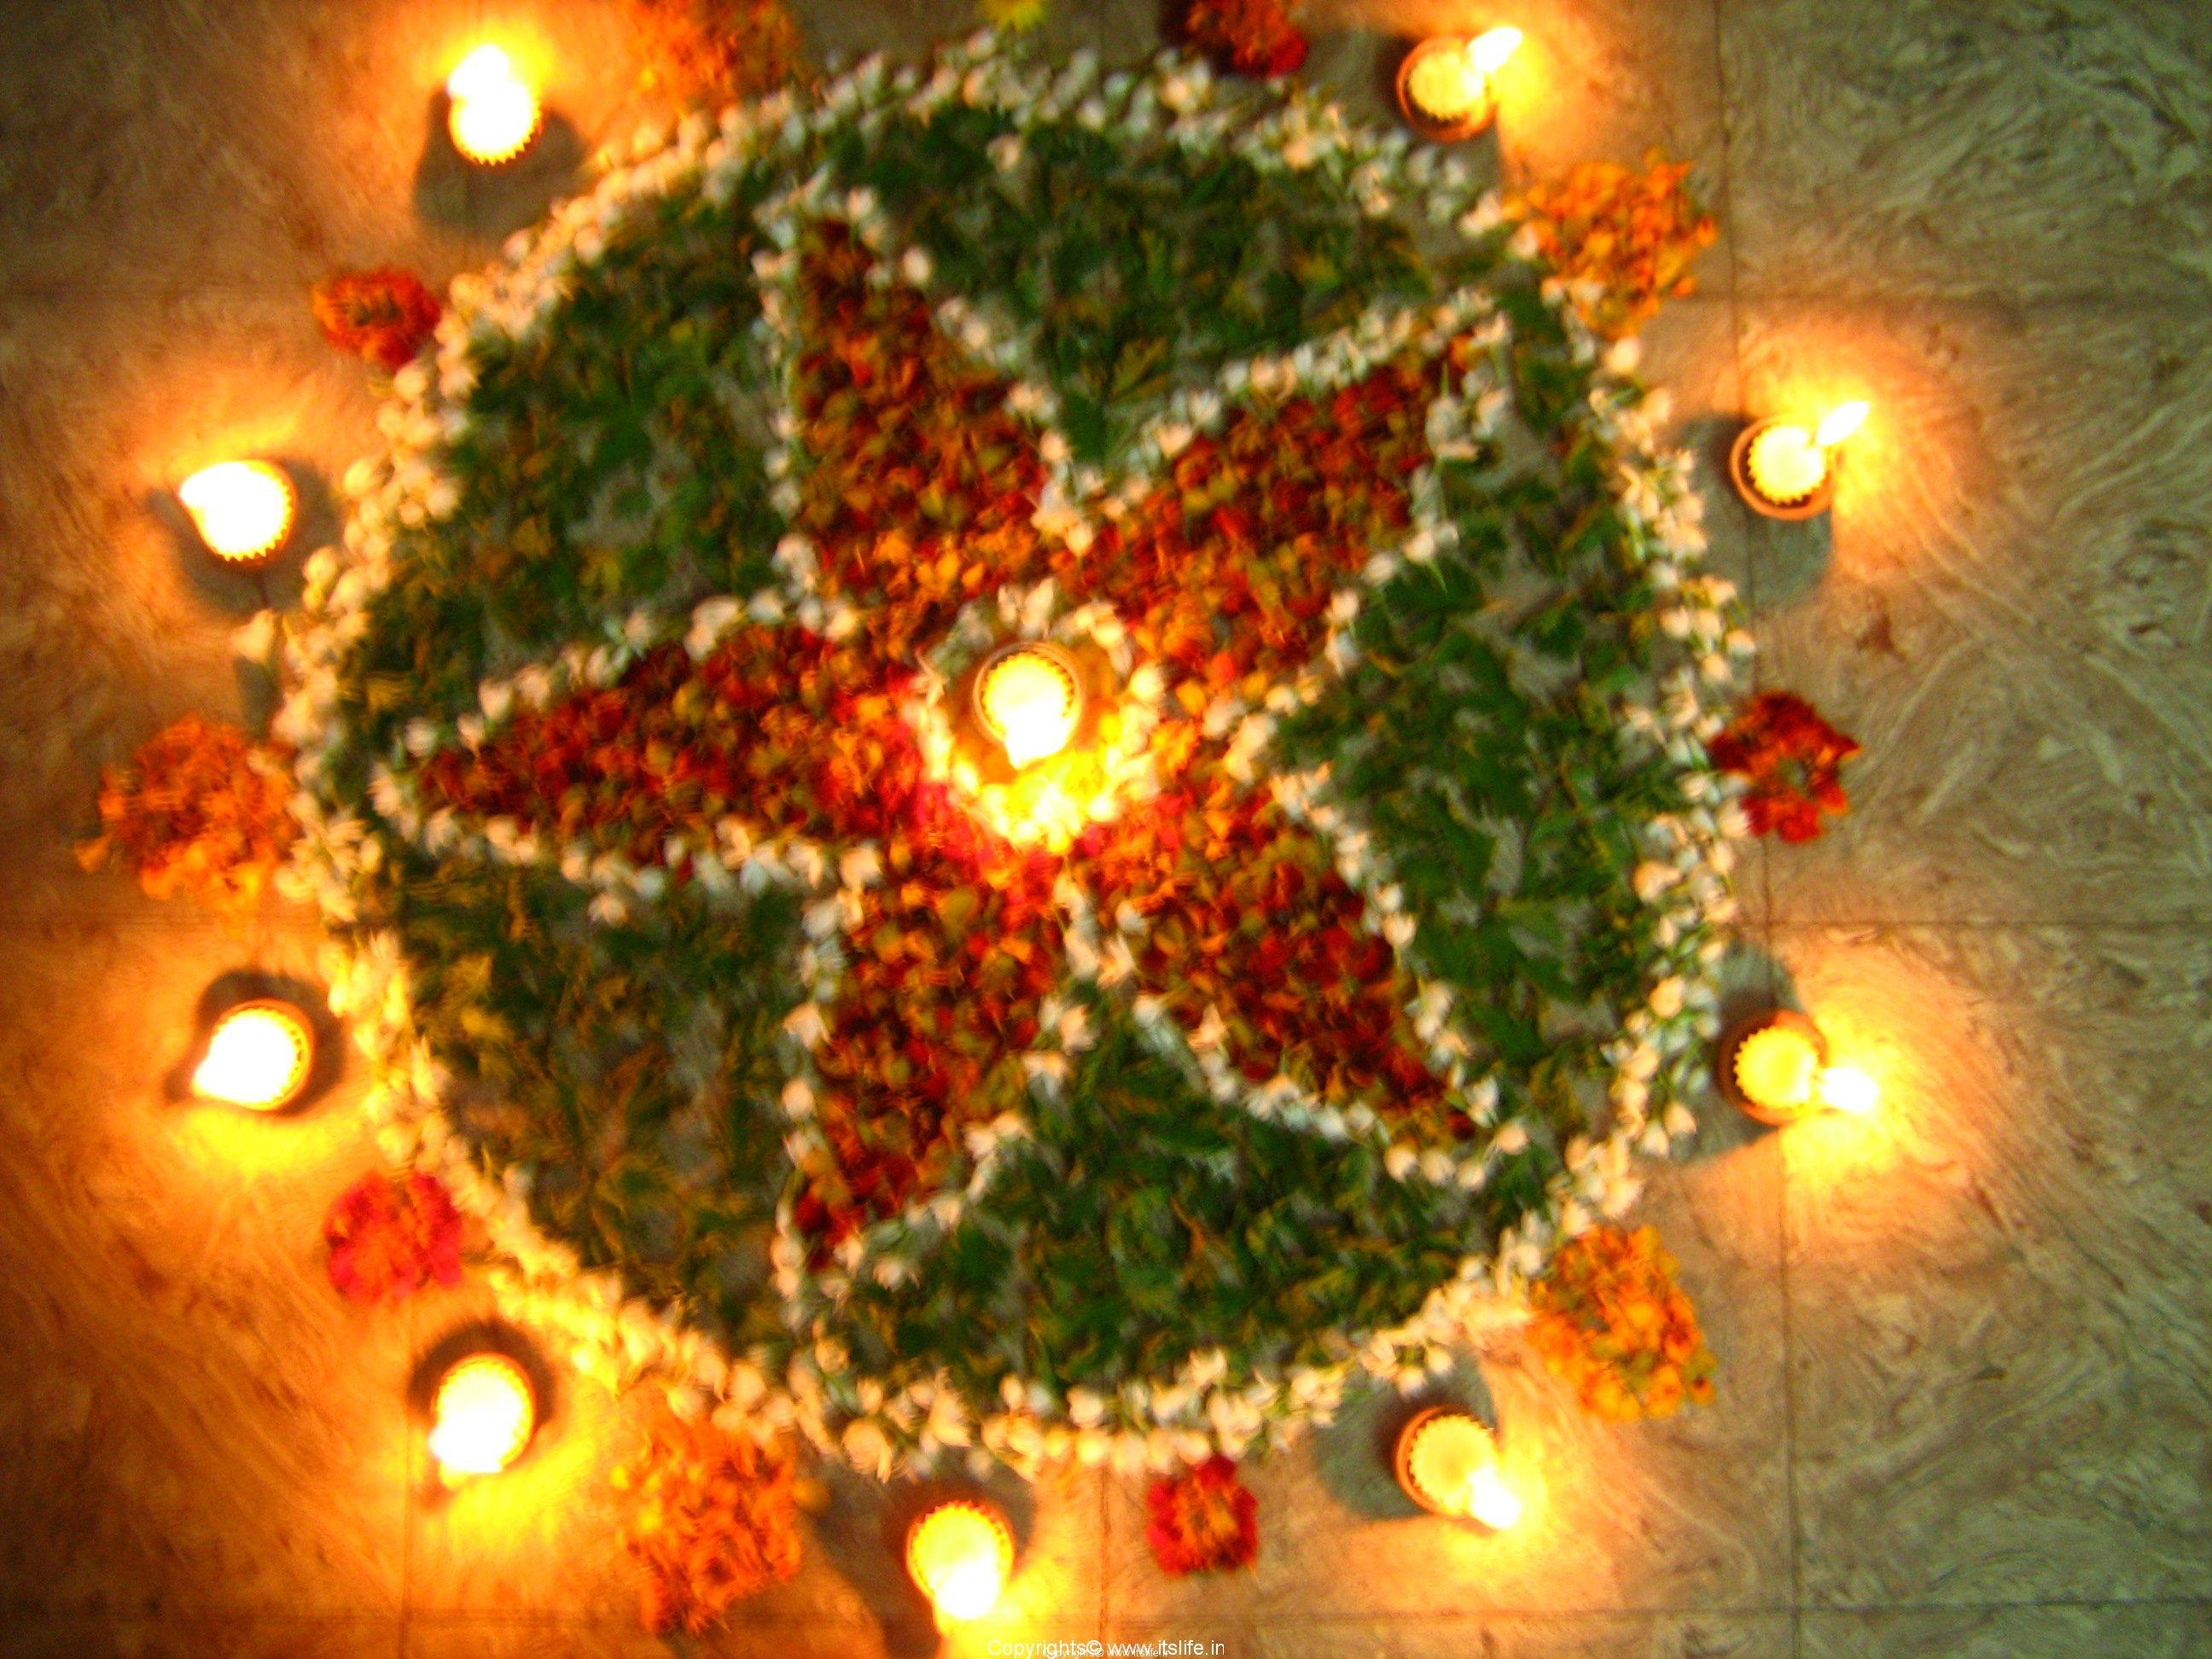 Rangoli designs for Diwali and